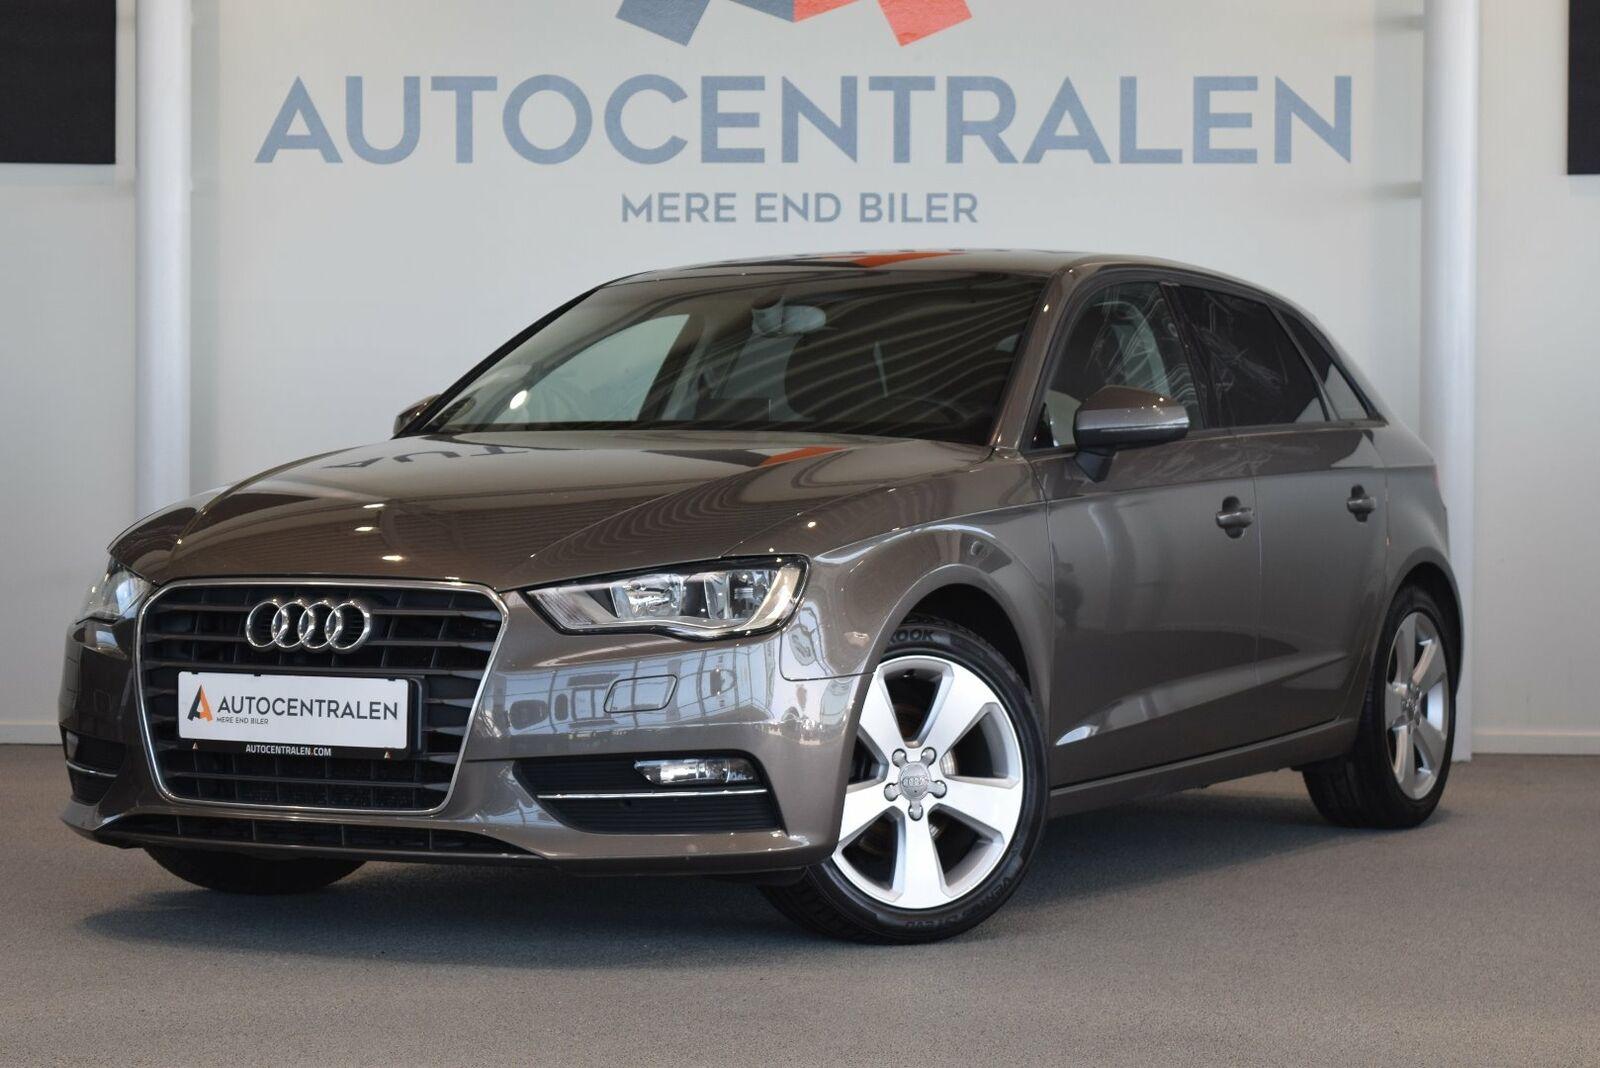 Audi A3 1,6 TDi 110 Ambition SB S-tr. 5d - 164.900 kr.